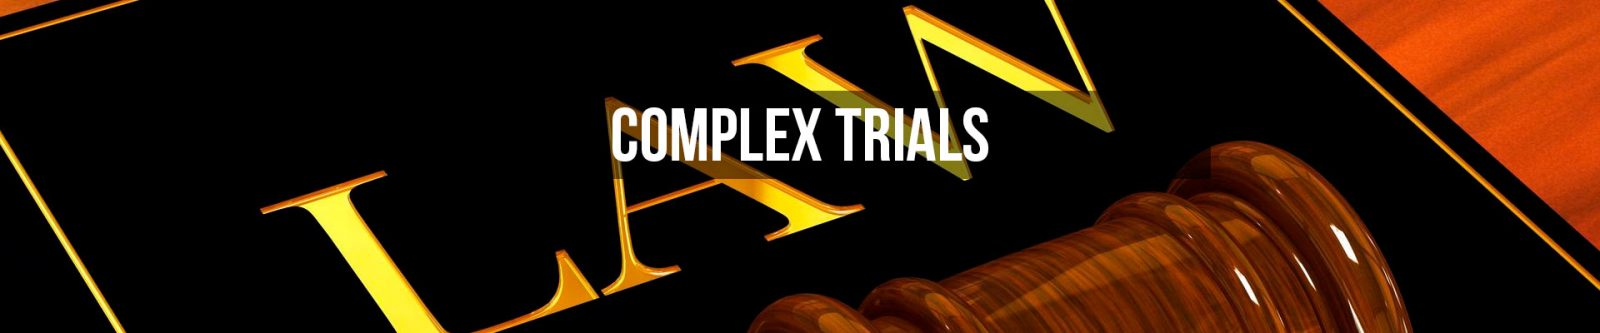 complex1